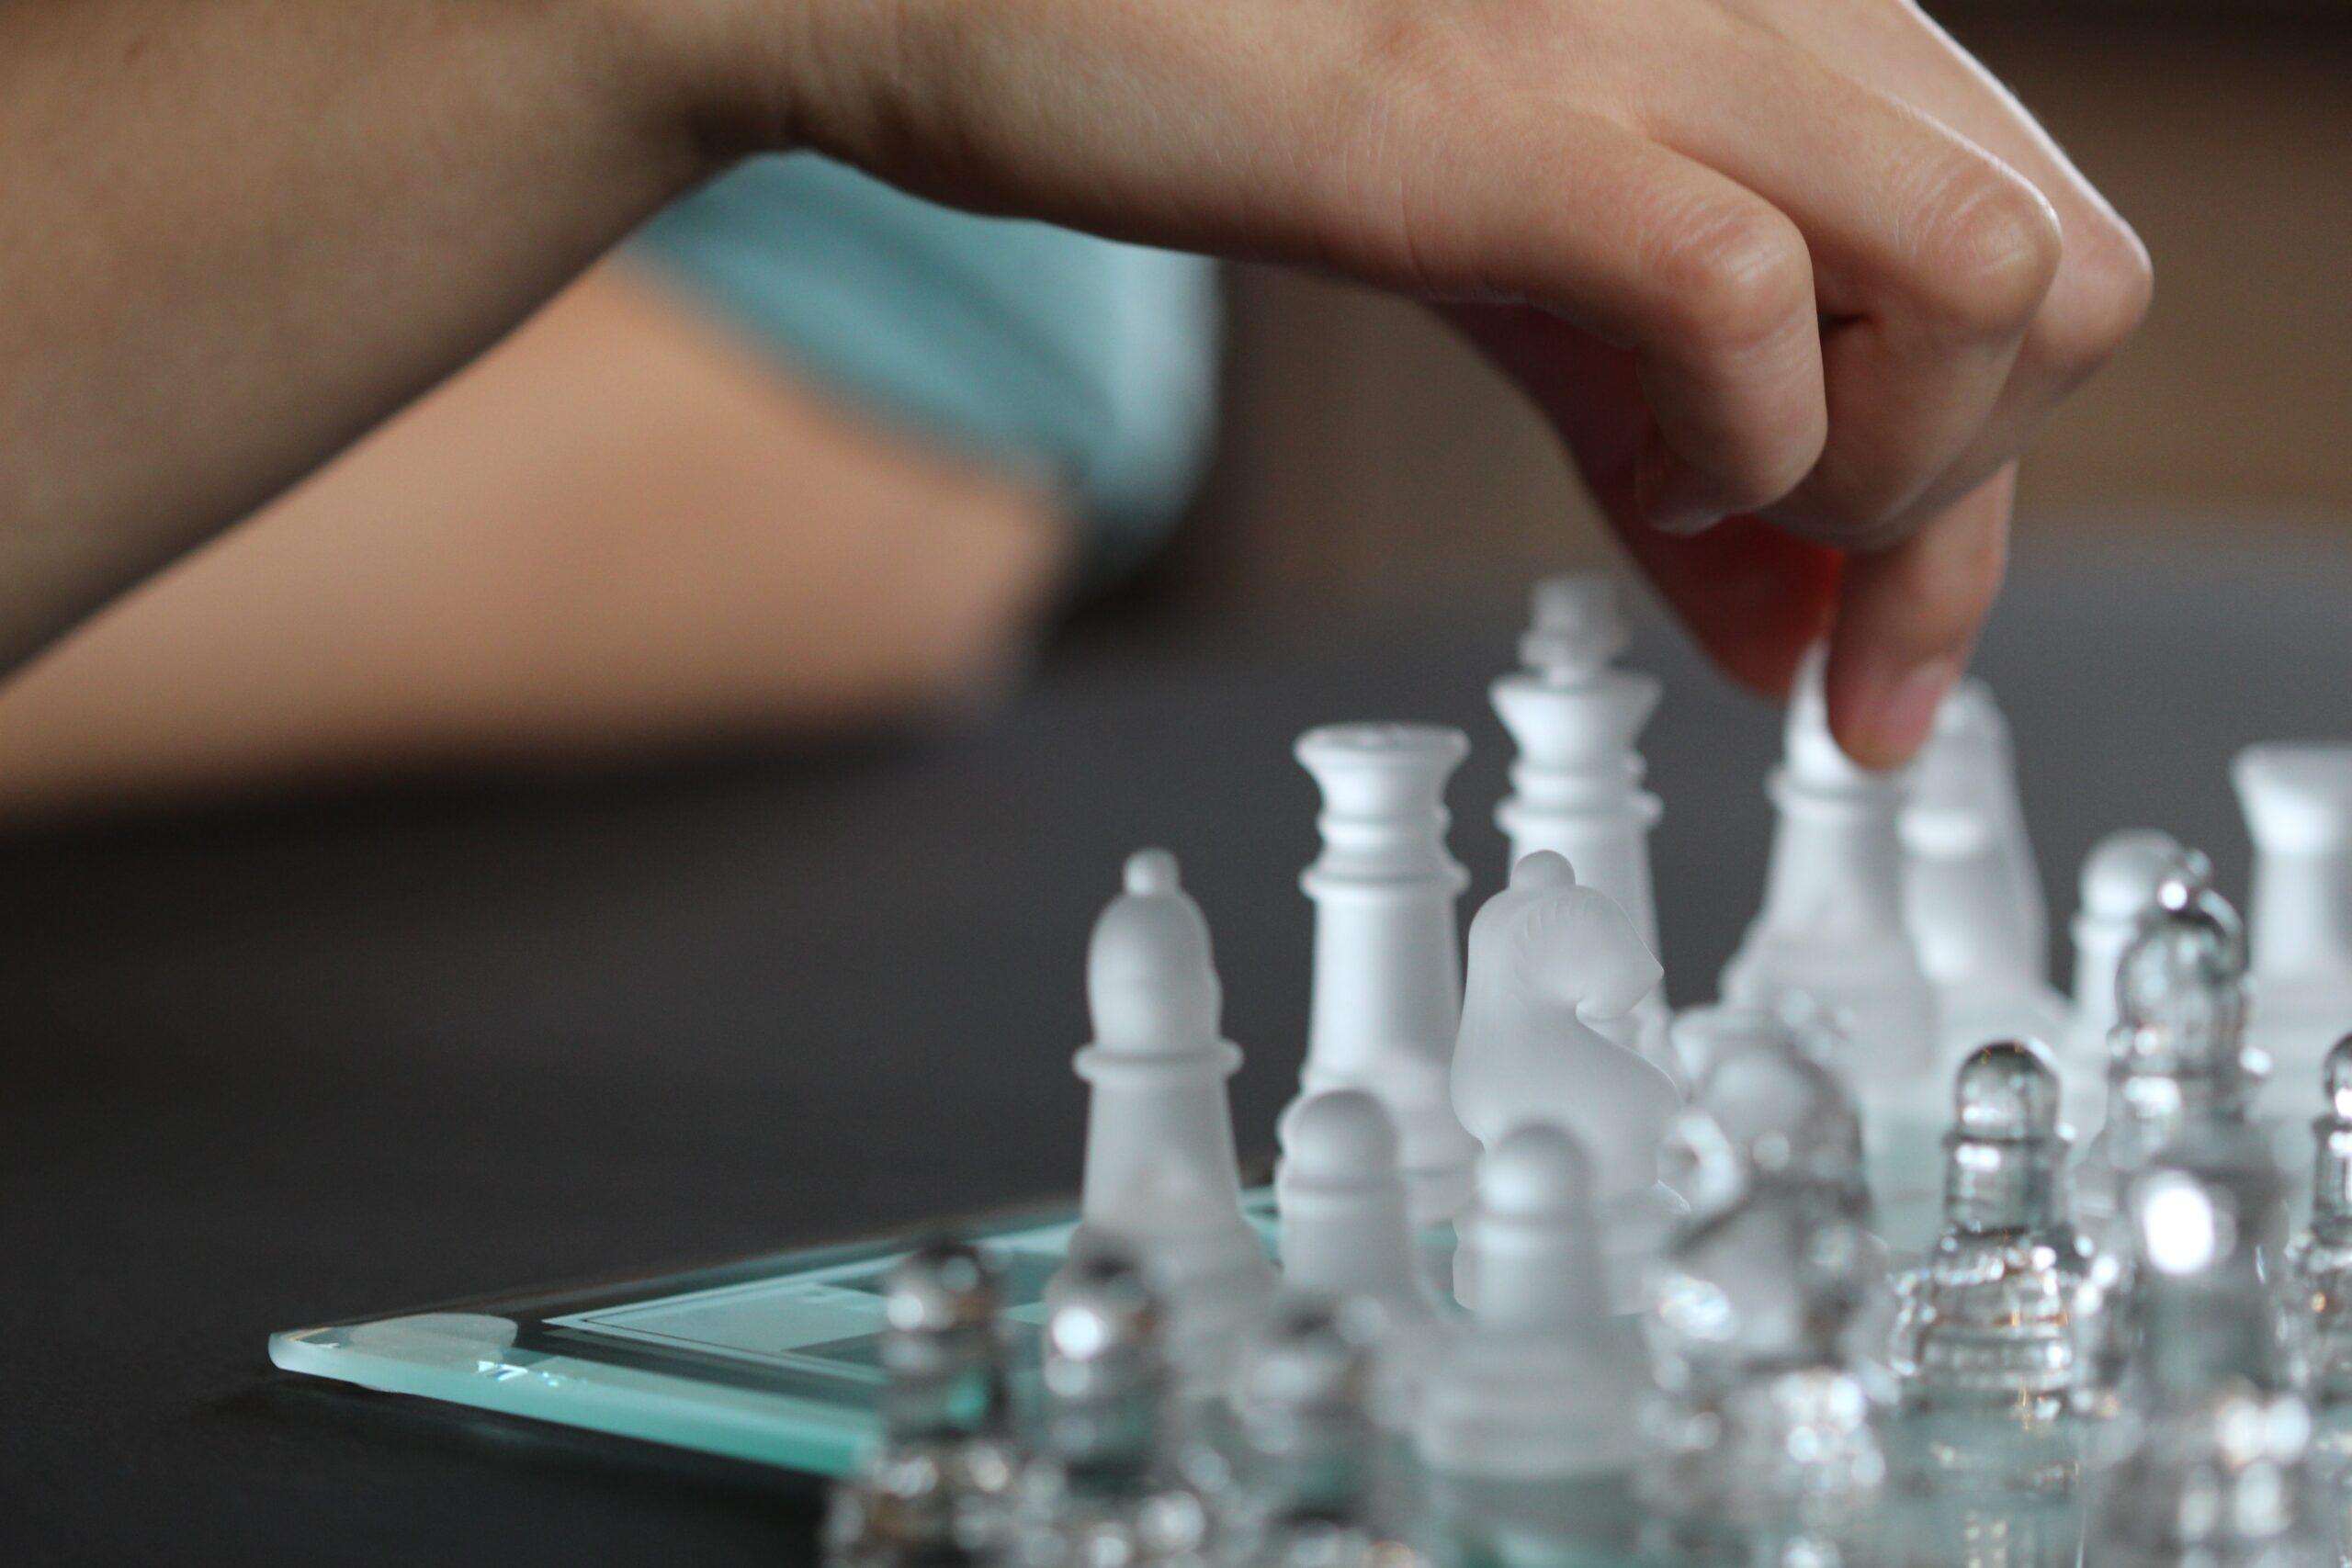 anne-nygard-Glass chess set hand in closeup moving piece-unsplash